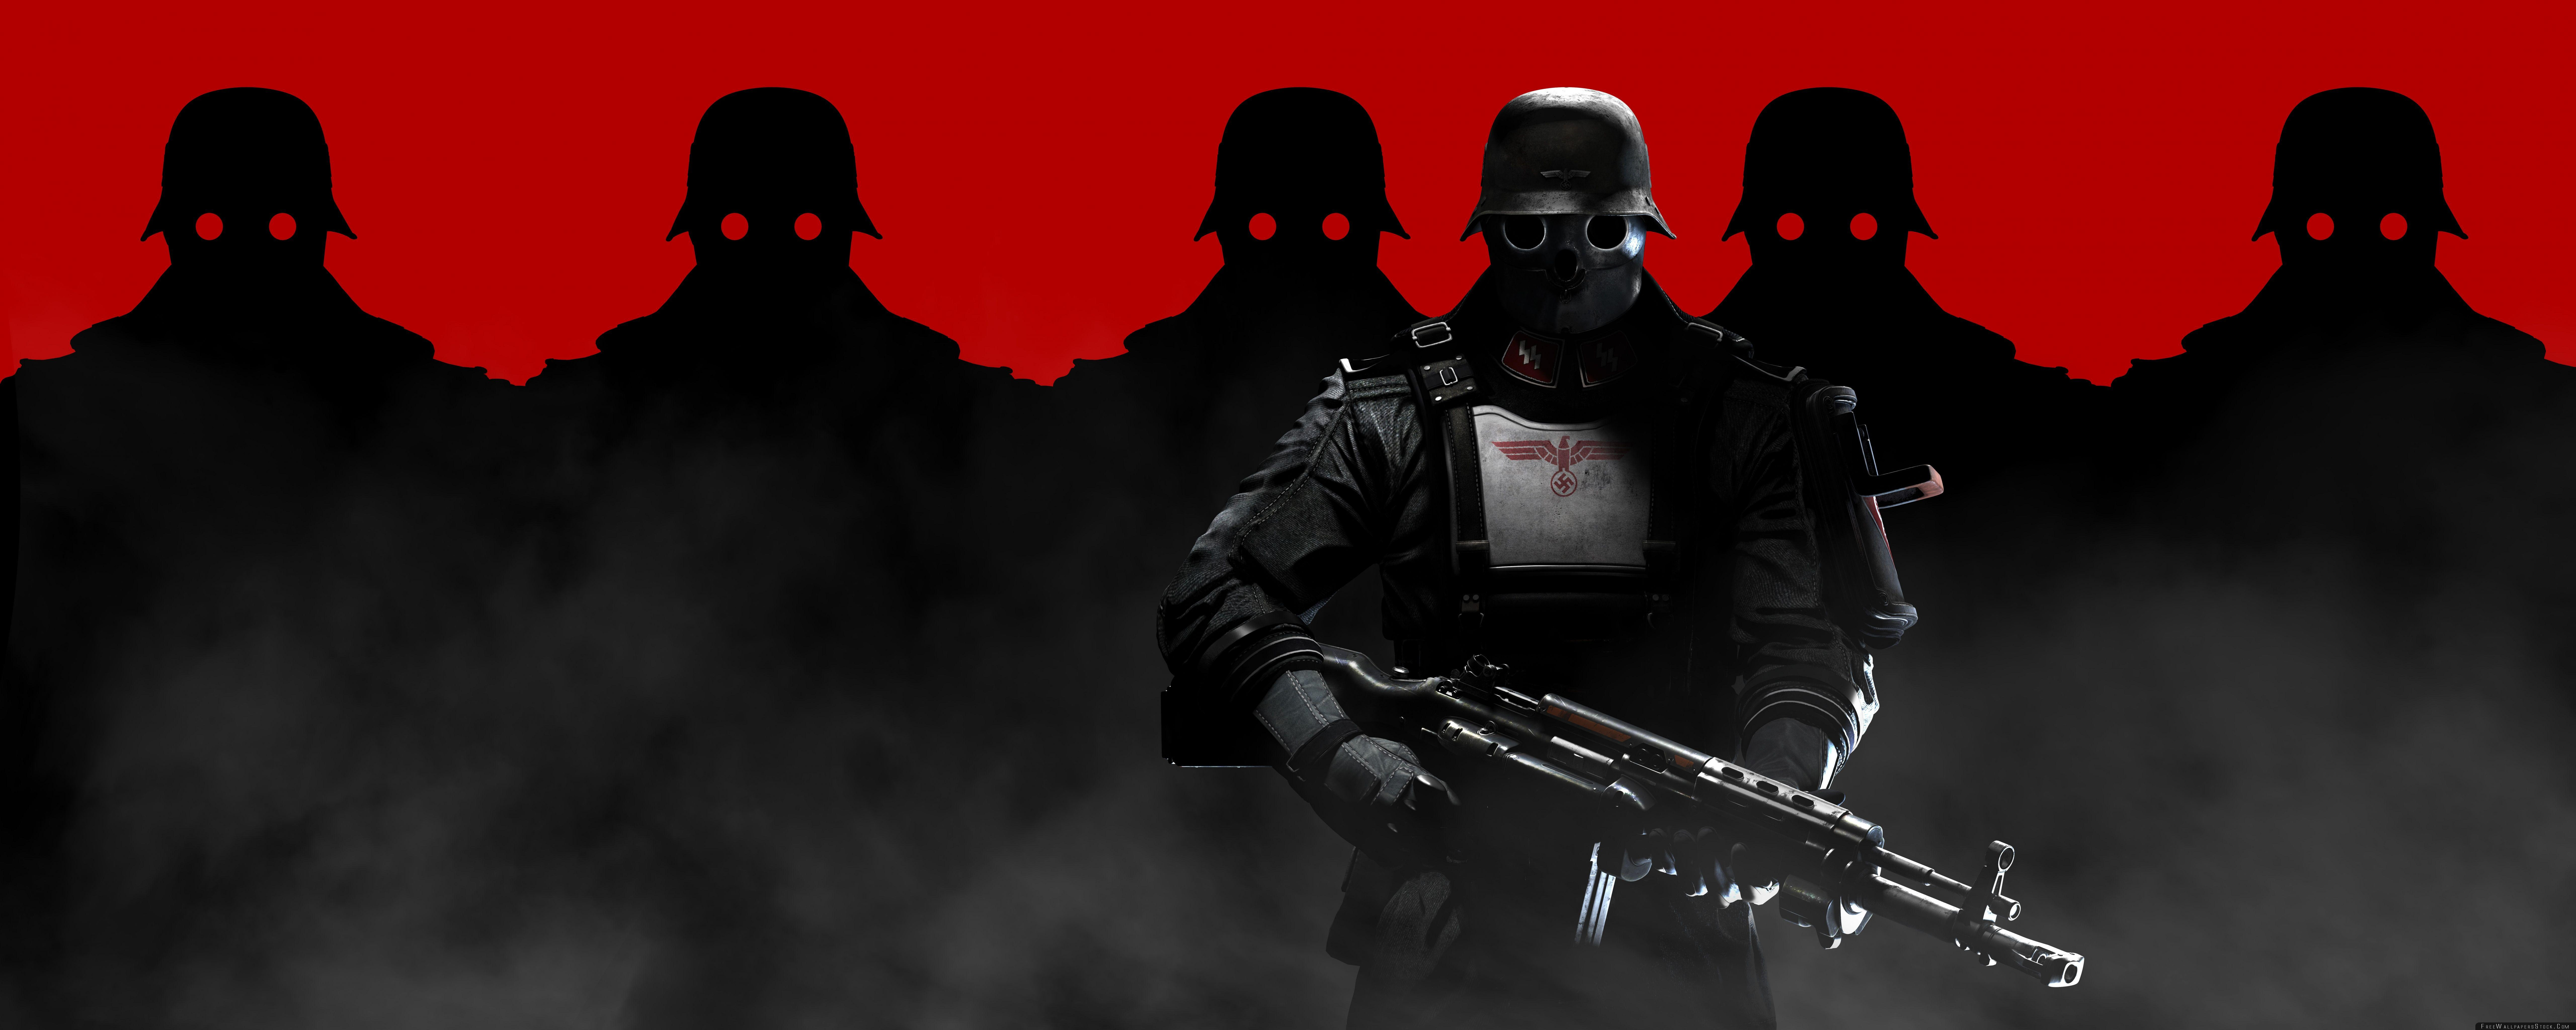 Download Free Wallpaper Wolfenstein The New Order Soldiers